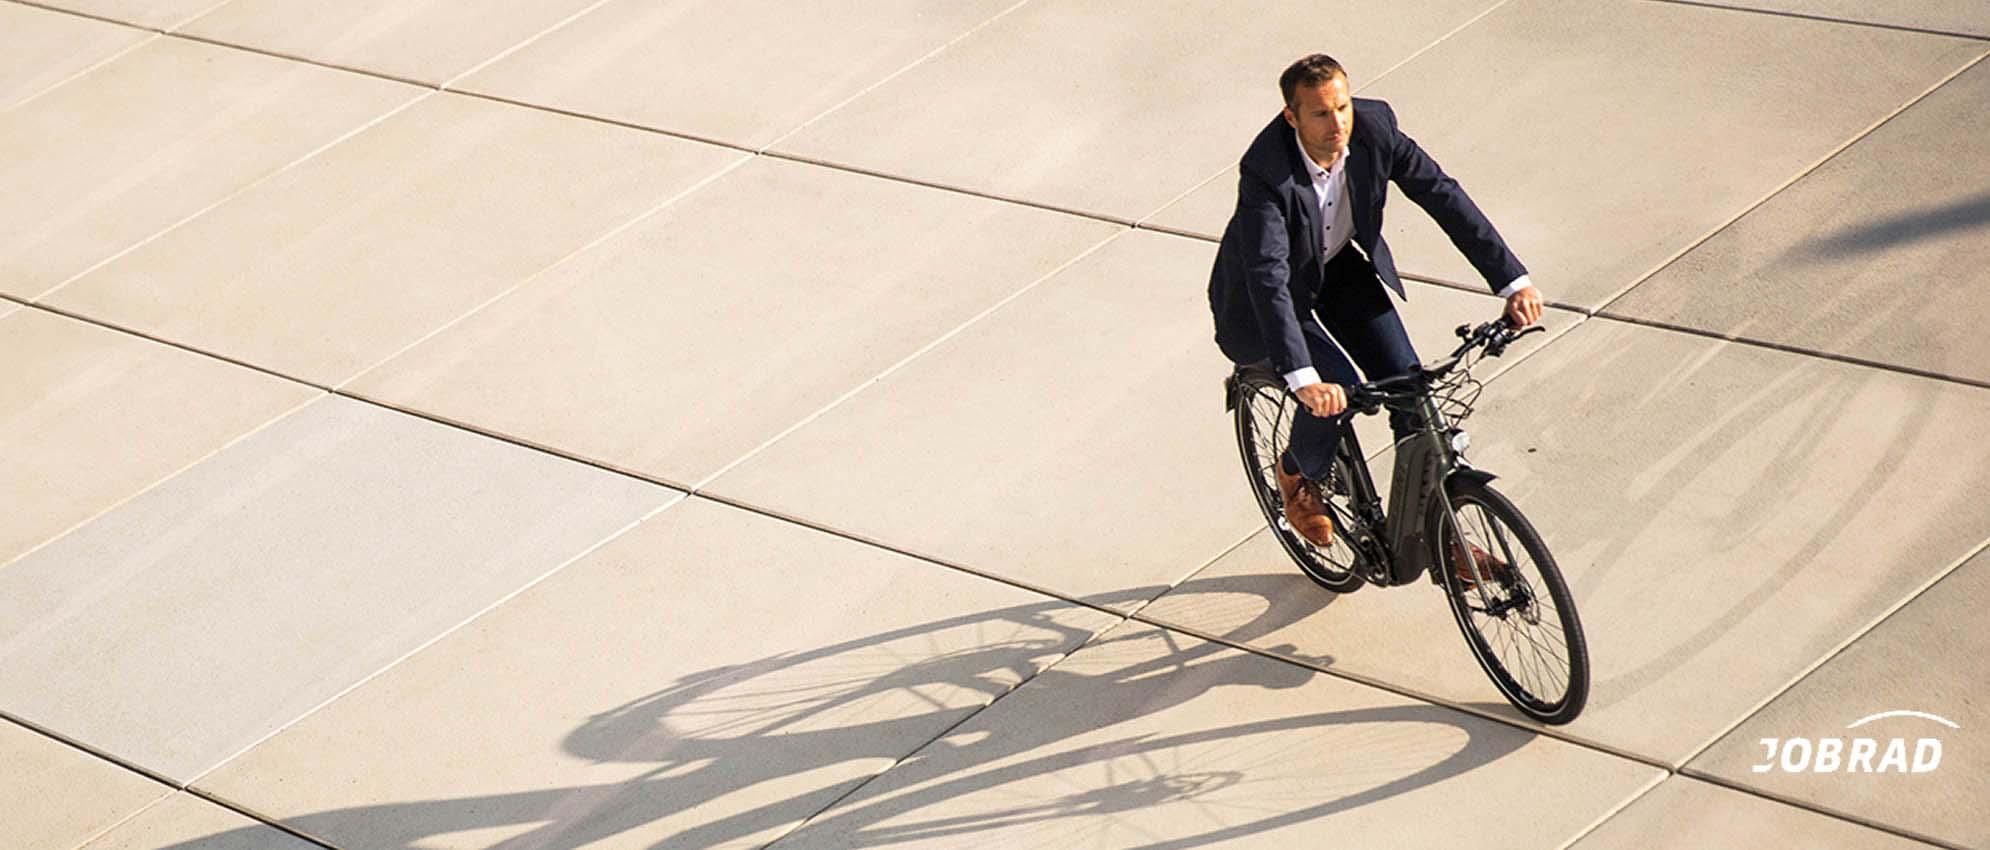 Fahrrad leasen - Jobrad in Salzwedel